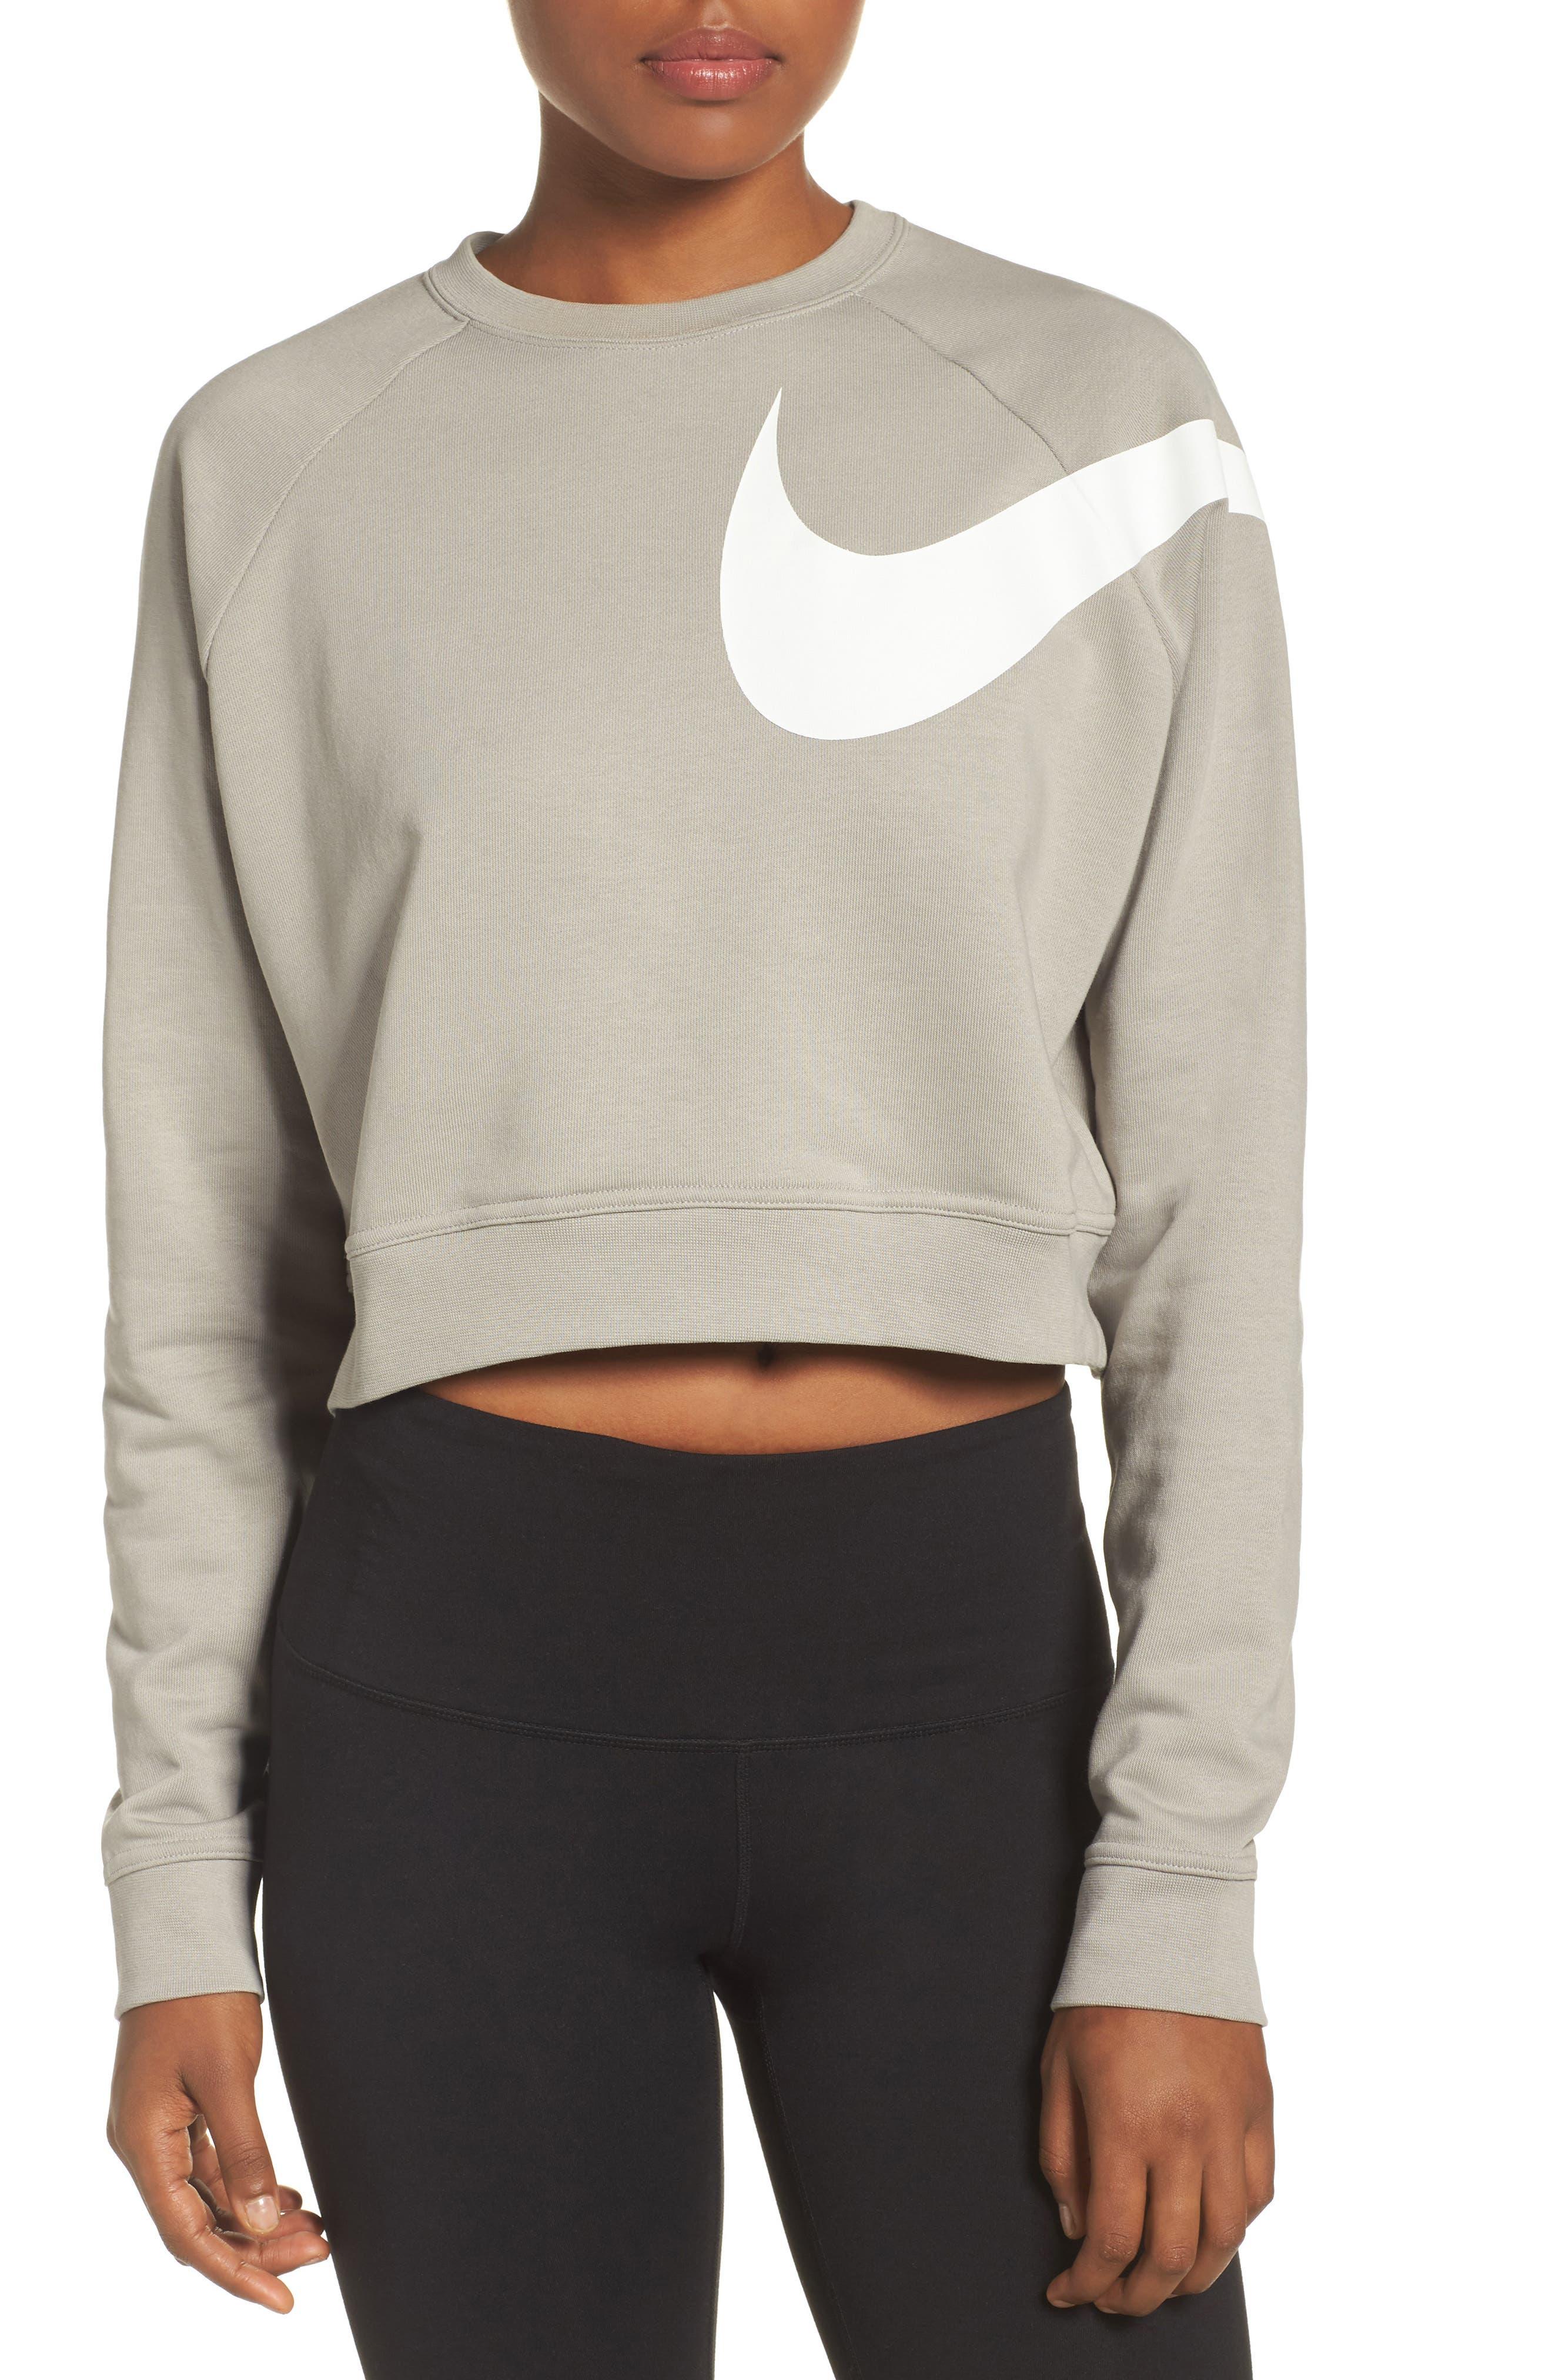 Main Image - Nike Dry Versa Training Crop Top